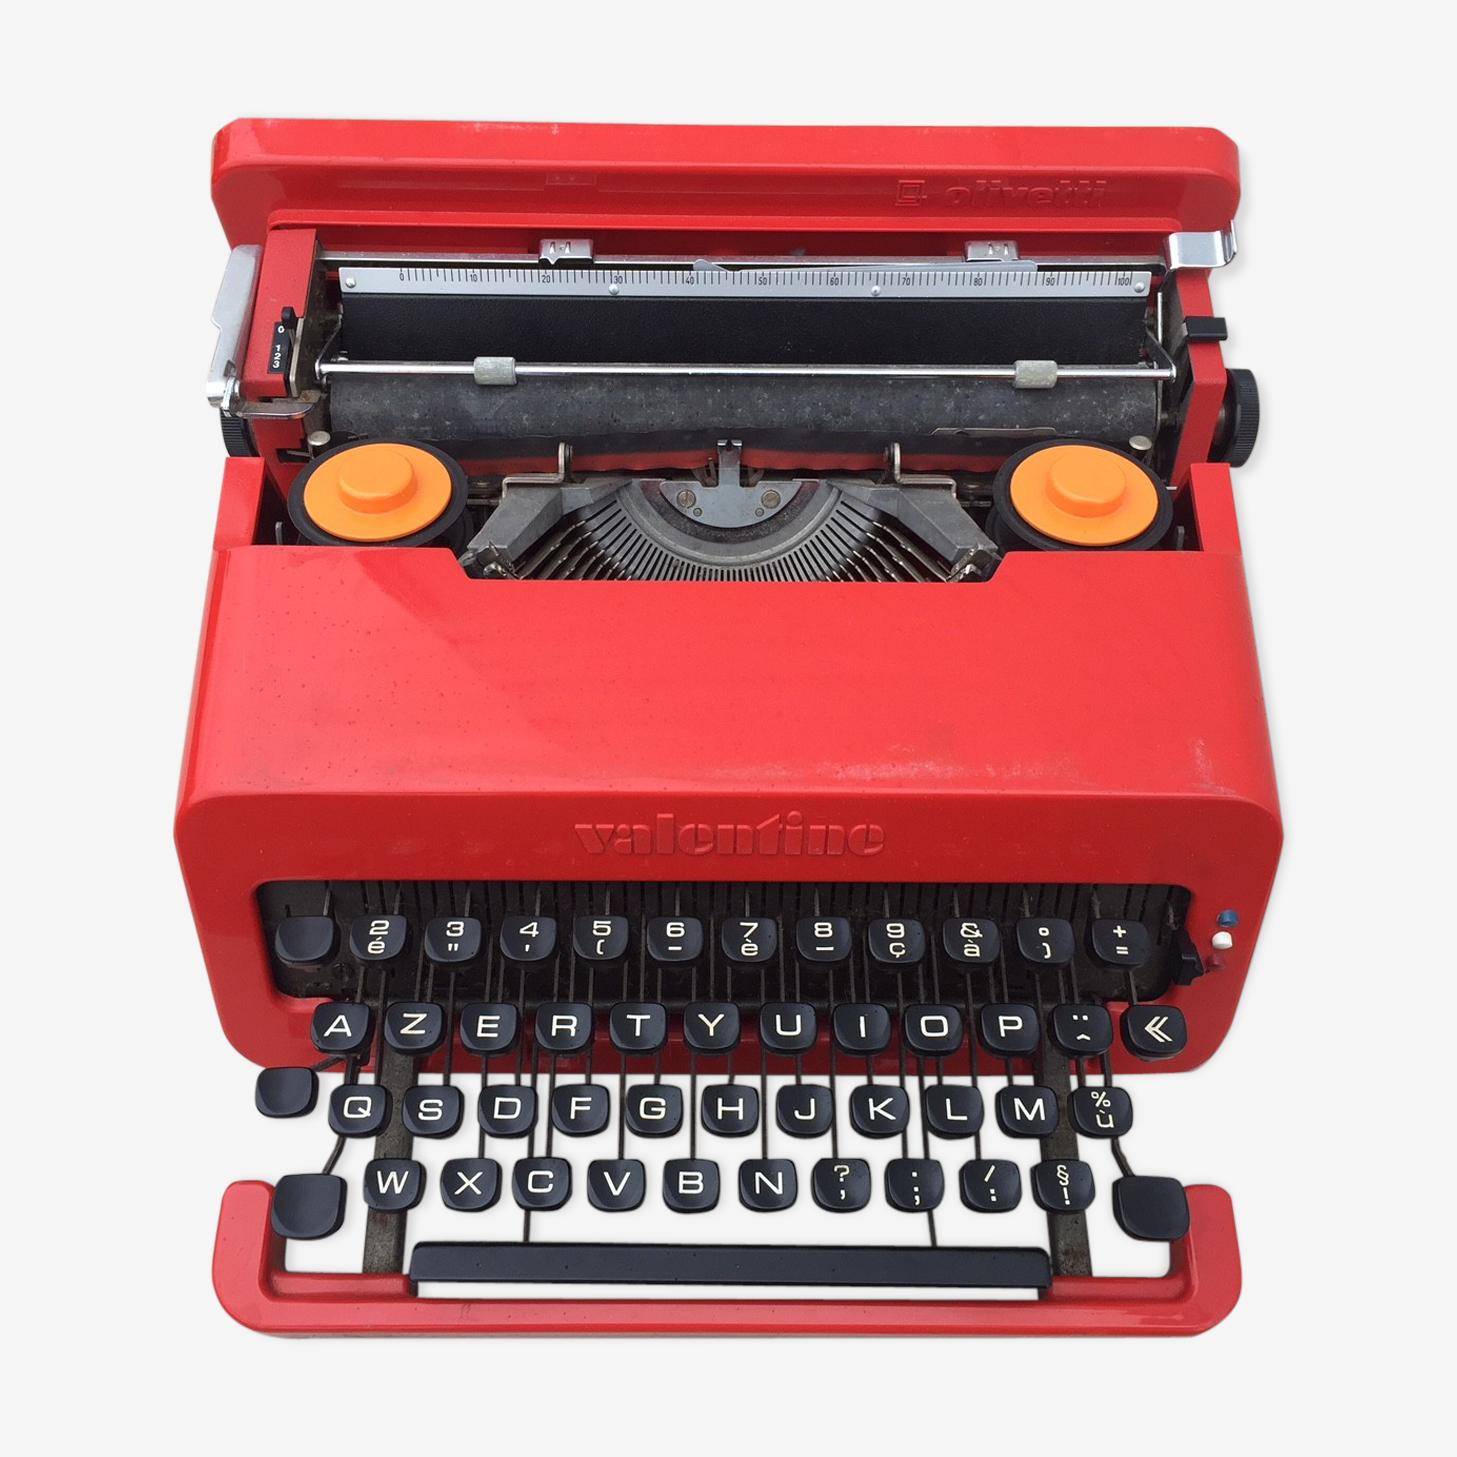 Ettore Sotsass Typewriter by Olivetti 1969